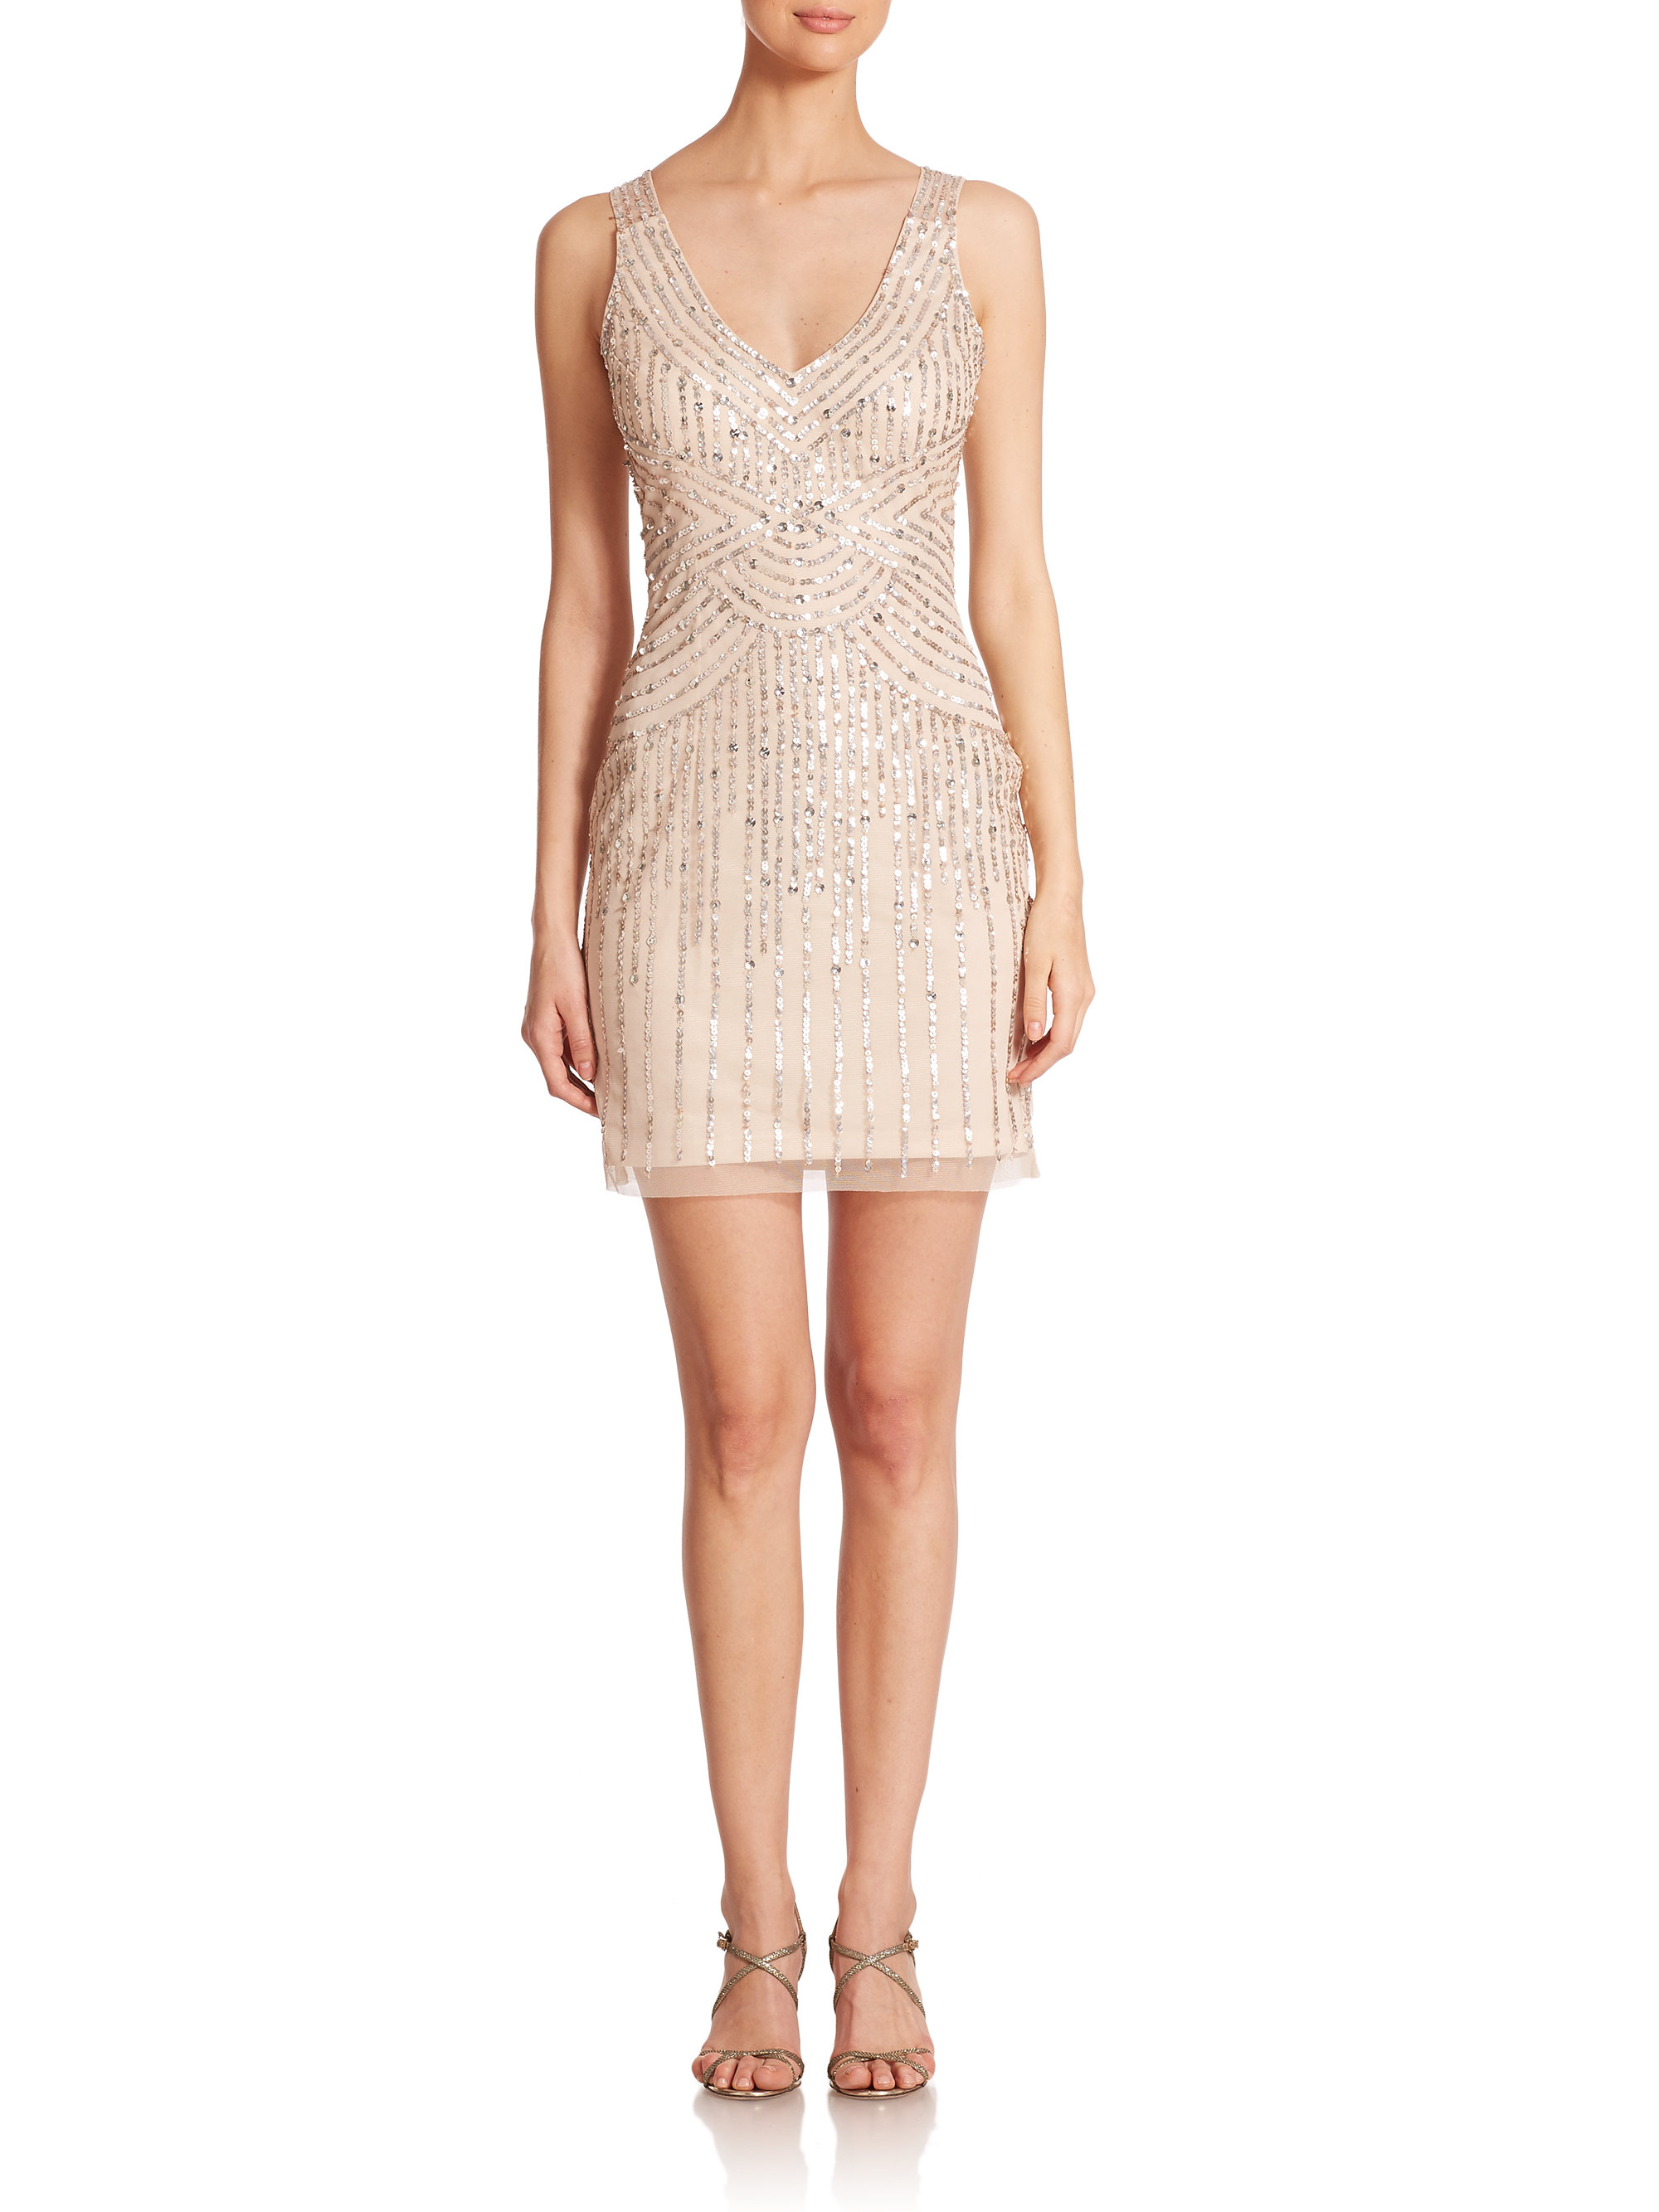 Aidan mattox illusion back sequin bridesmaid dress in for Metallic bridesmaid dresses wedding